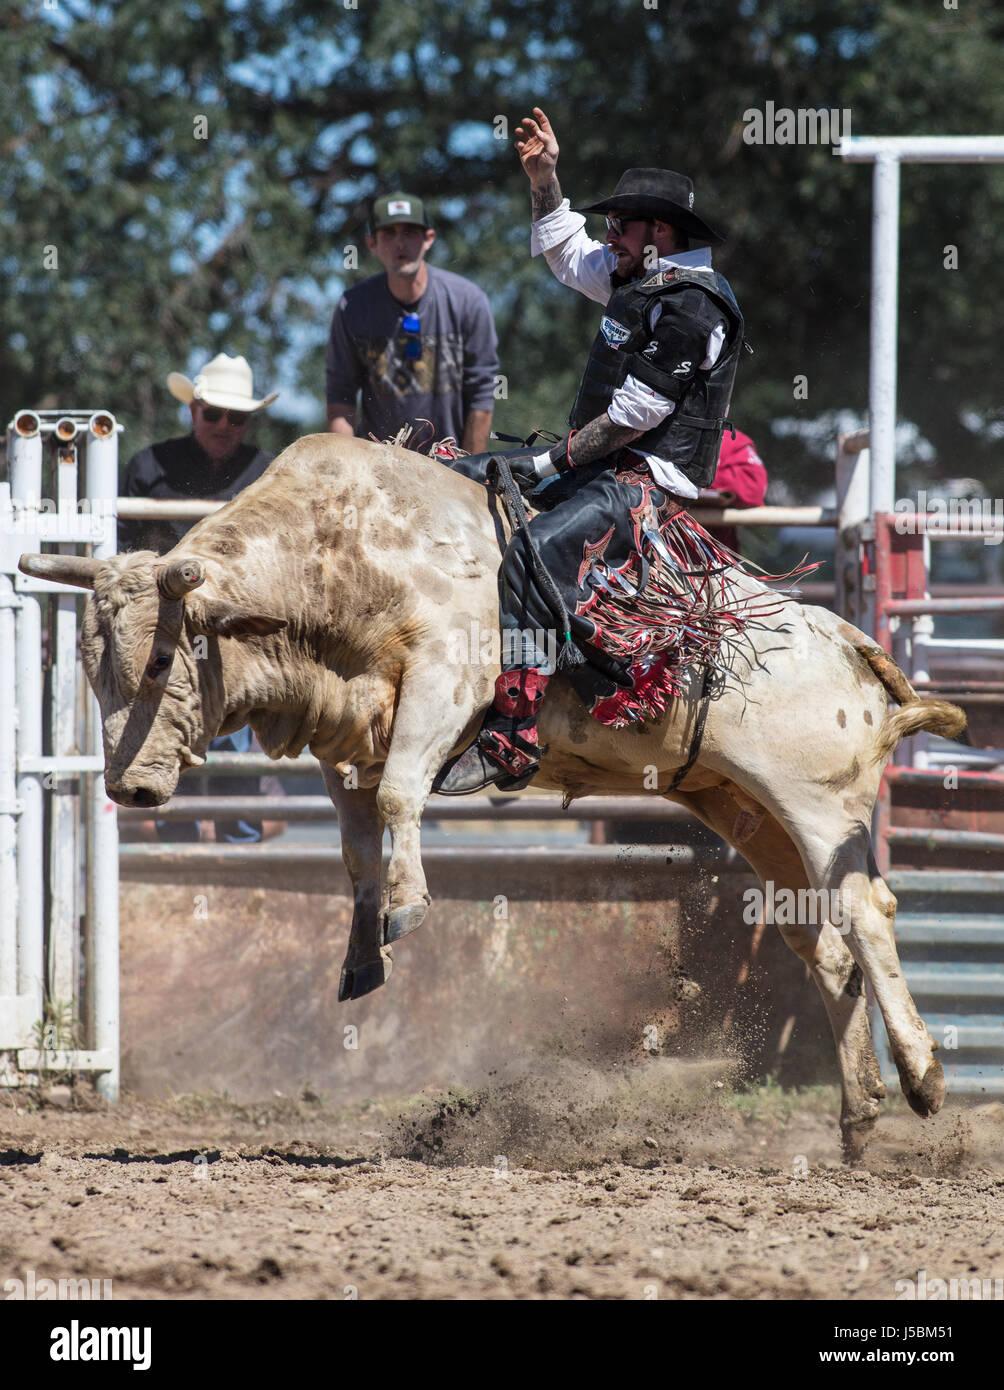 Saddle Ranch Bull Stock Photos Amp Saddle Ranch Bull Stock